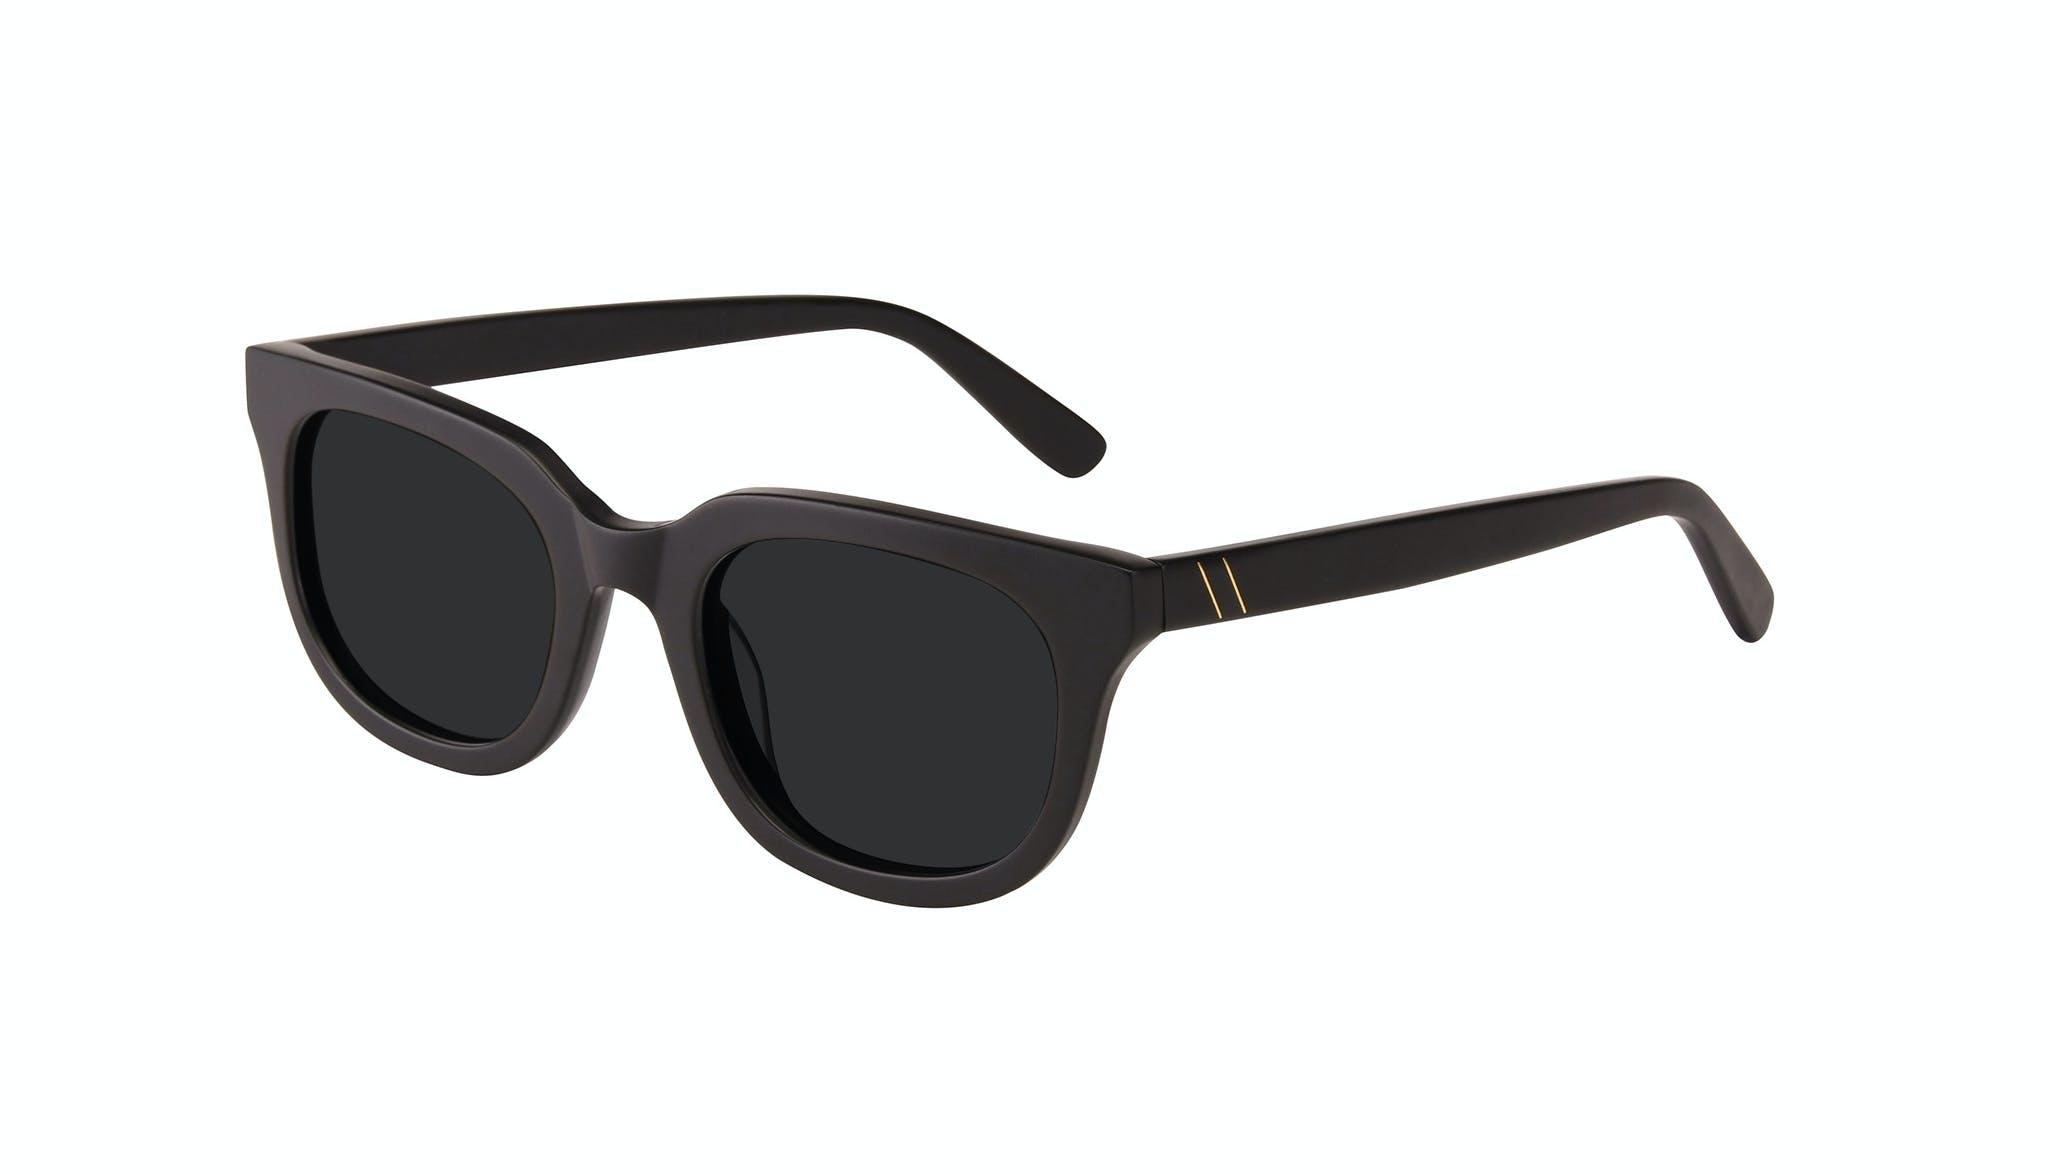 Affordable Fashion Glasses Square Sunglasses Men Stout Matte Black Tilt